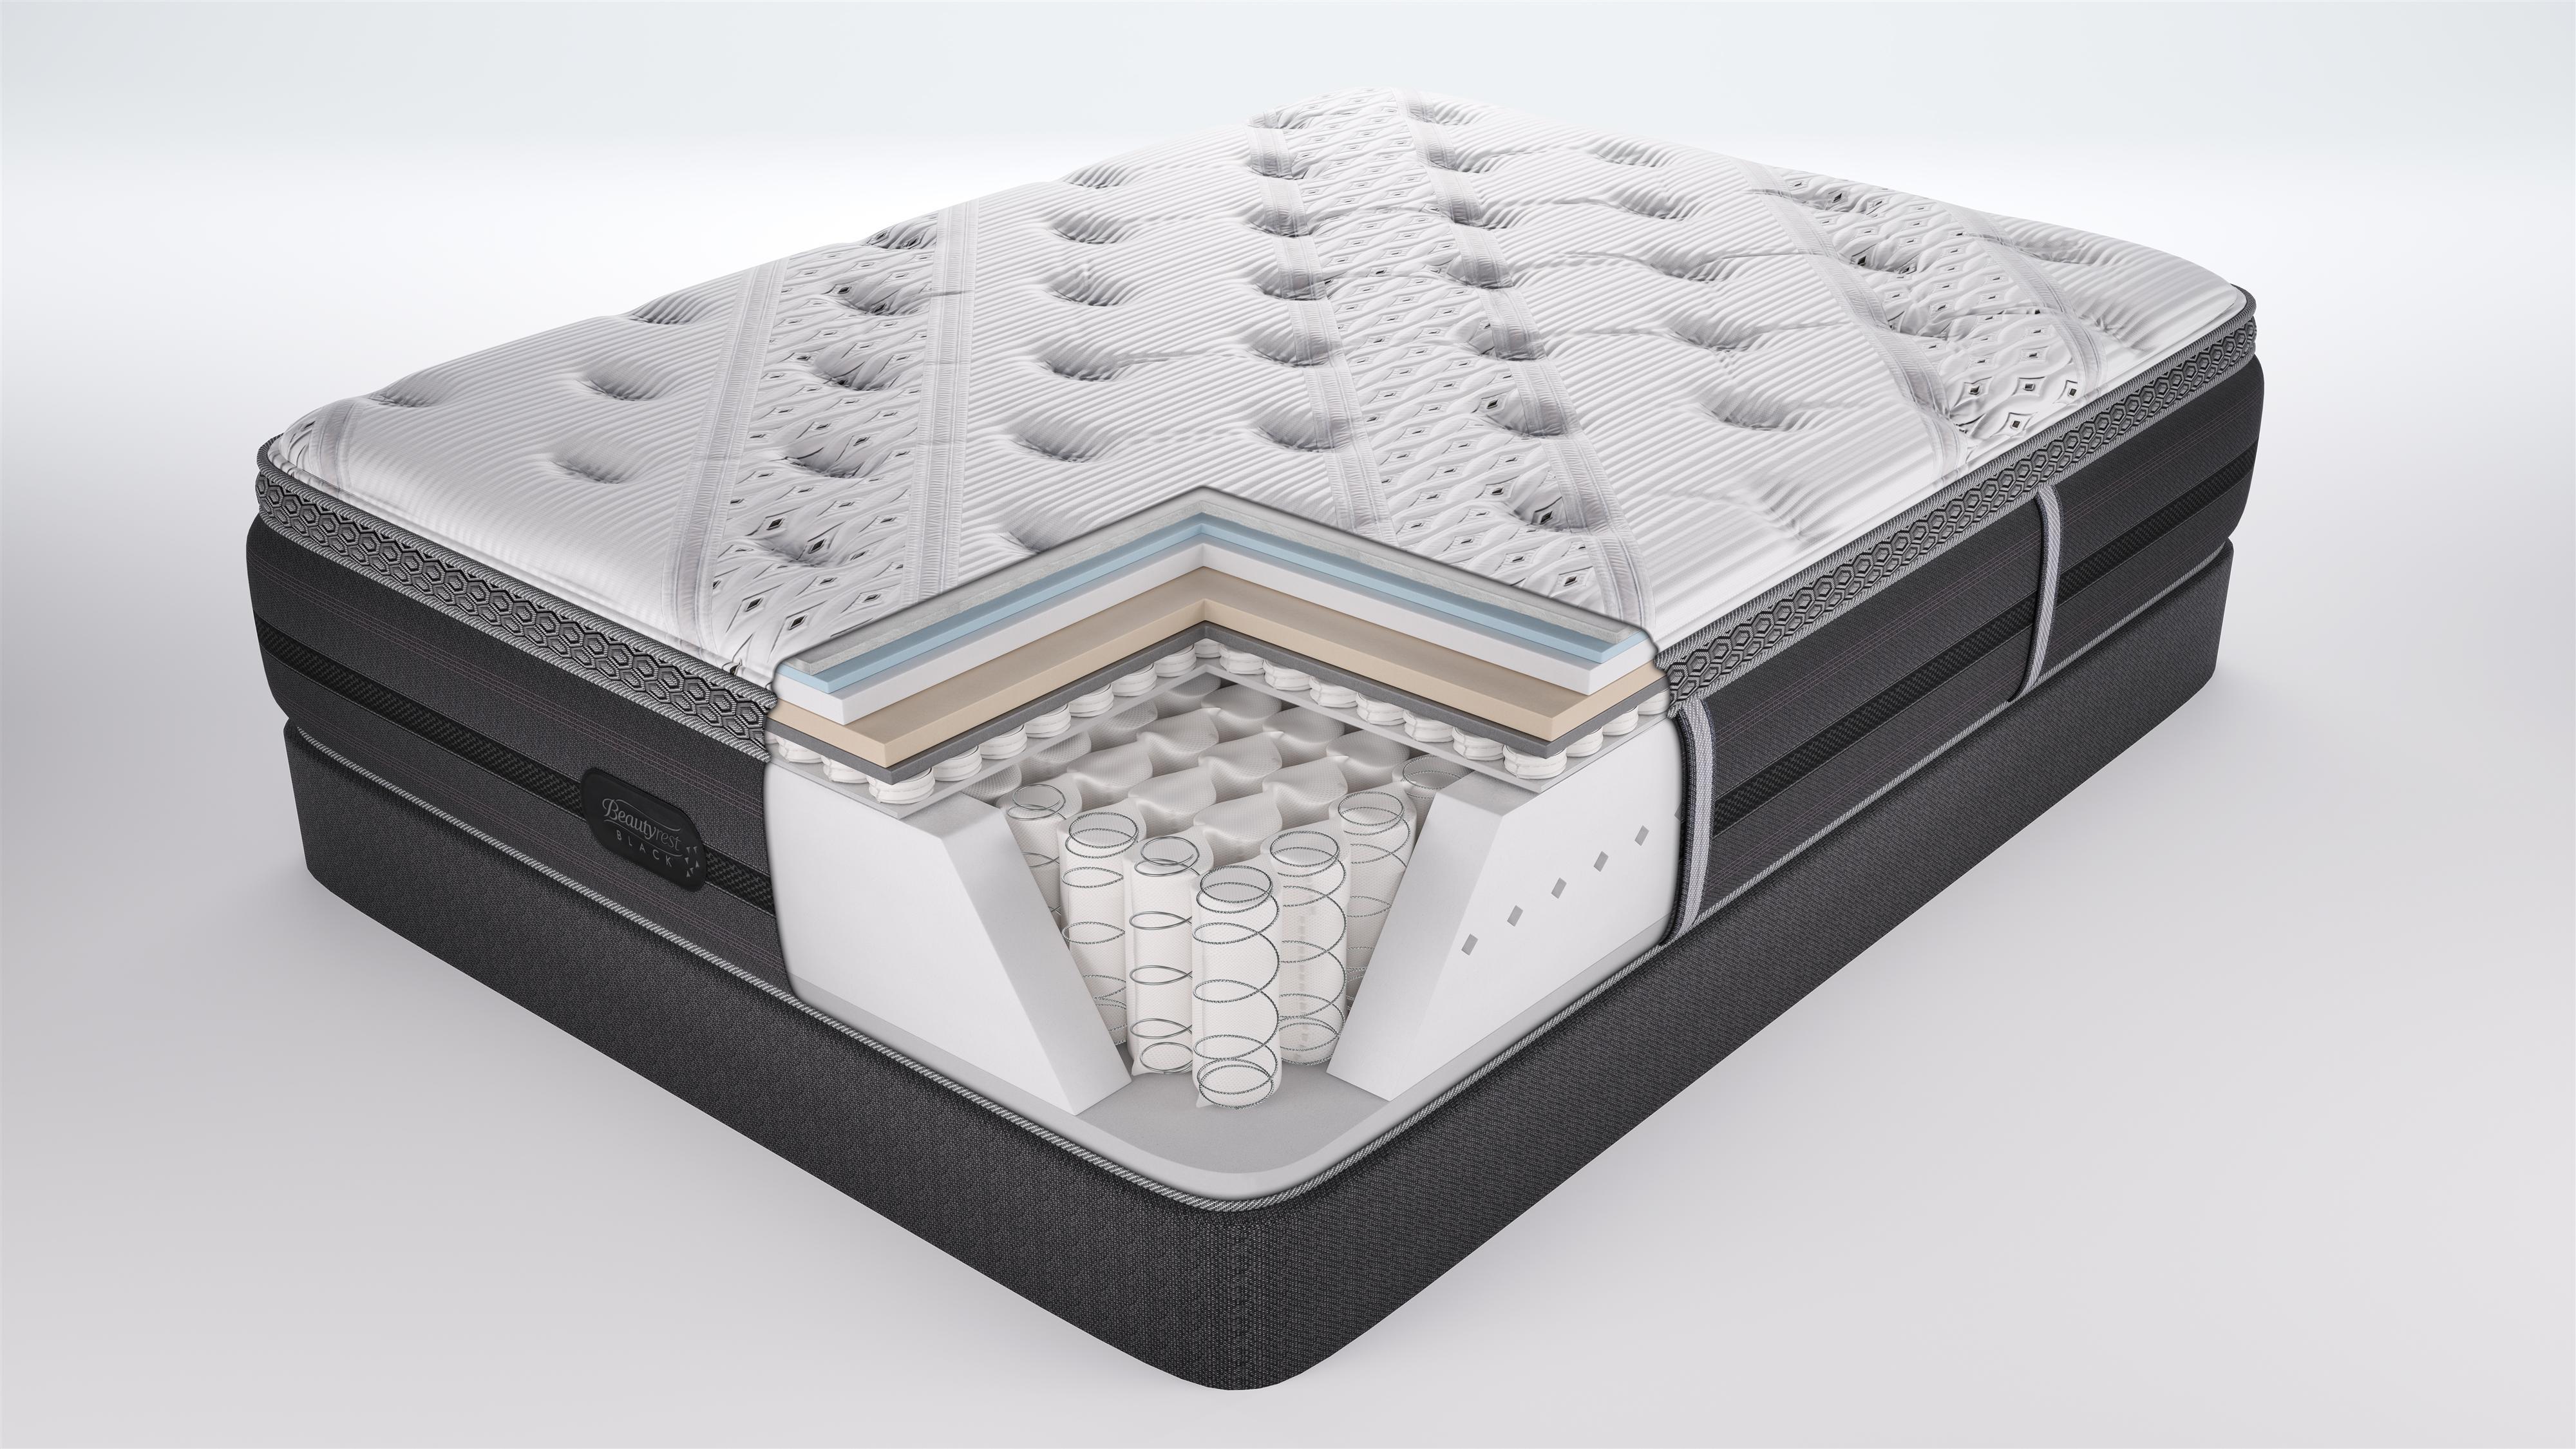 down mattress top amazon mattresses ideas pillow hypoallergenic superior white topper queen